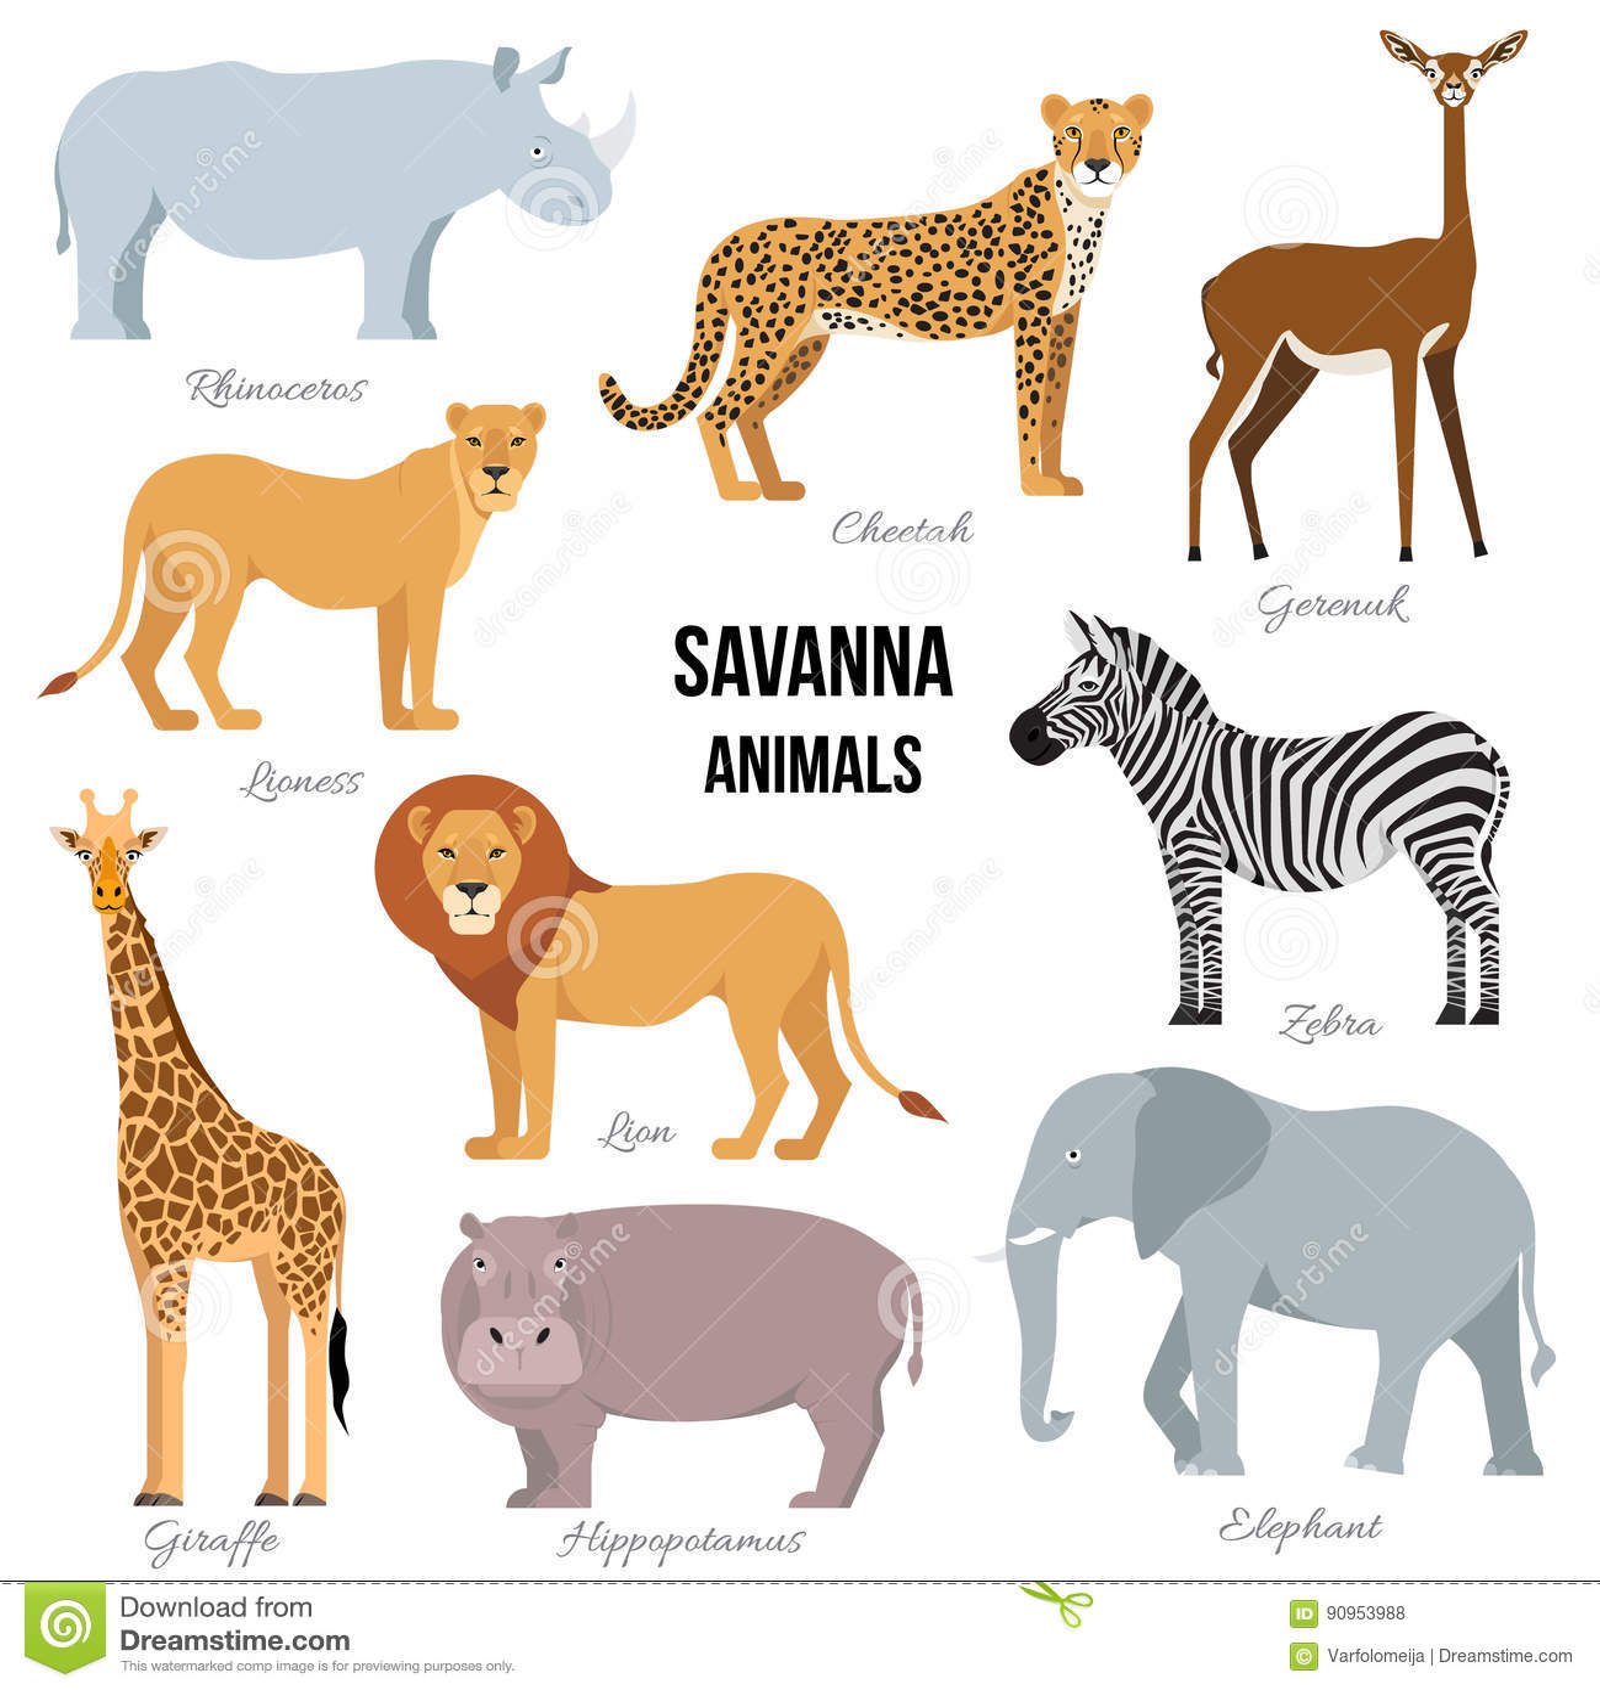 African Animals Of Savanna Elephant Rhino Giraffe